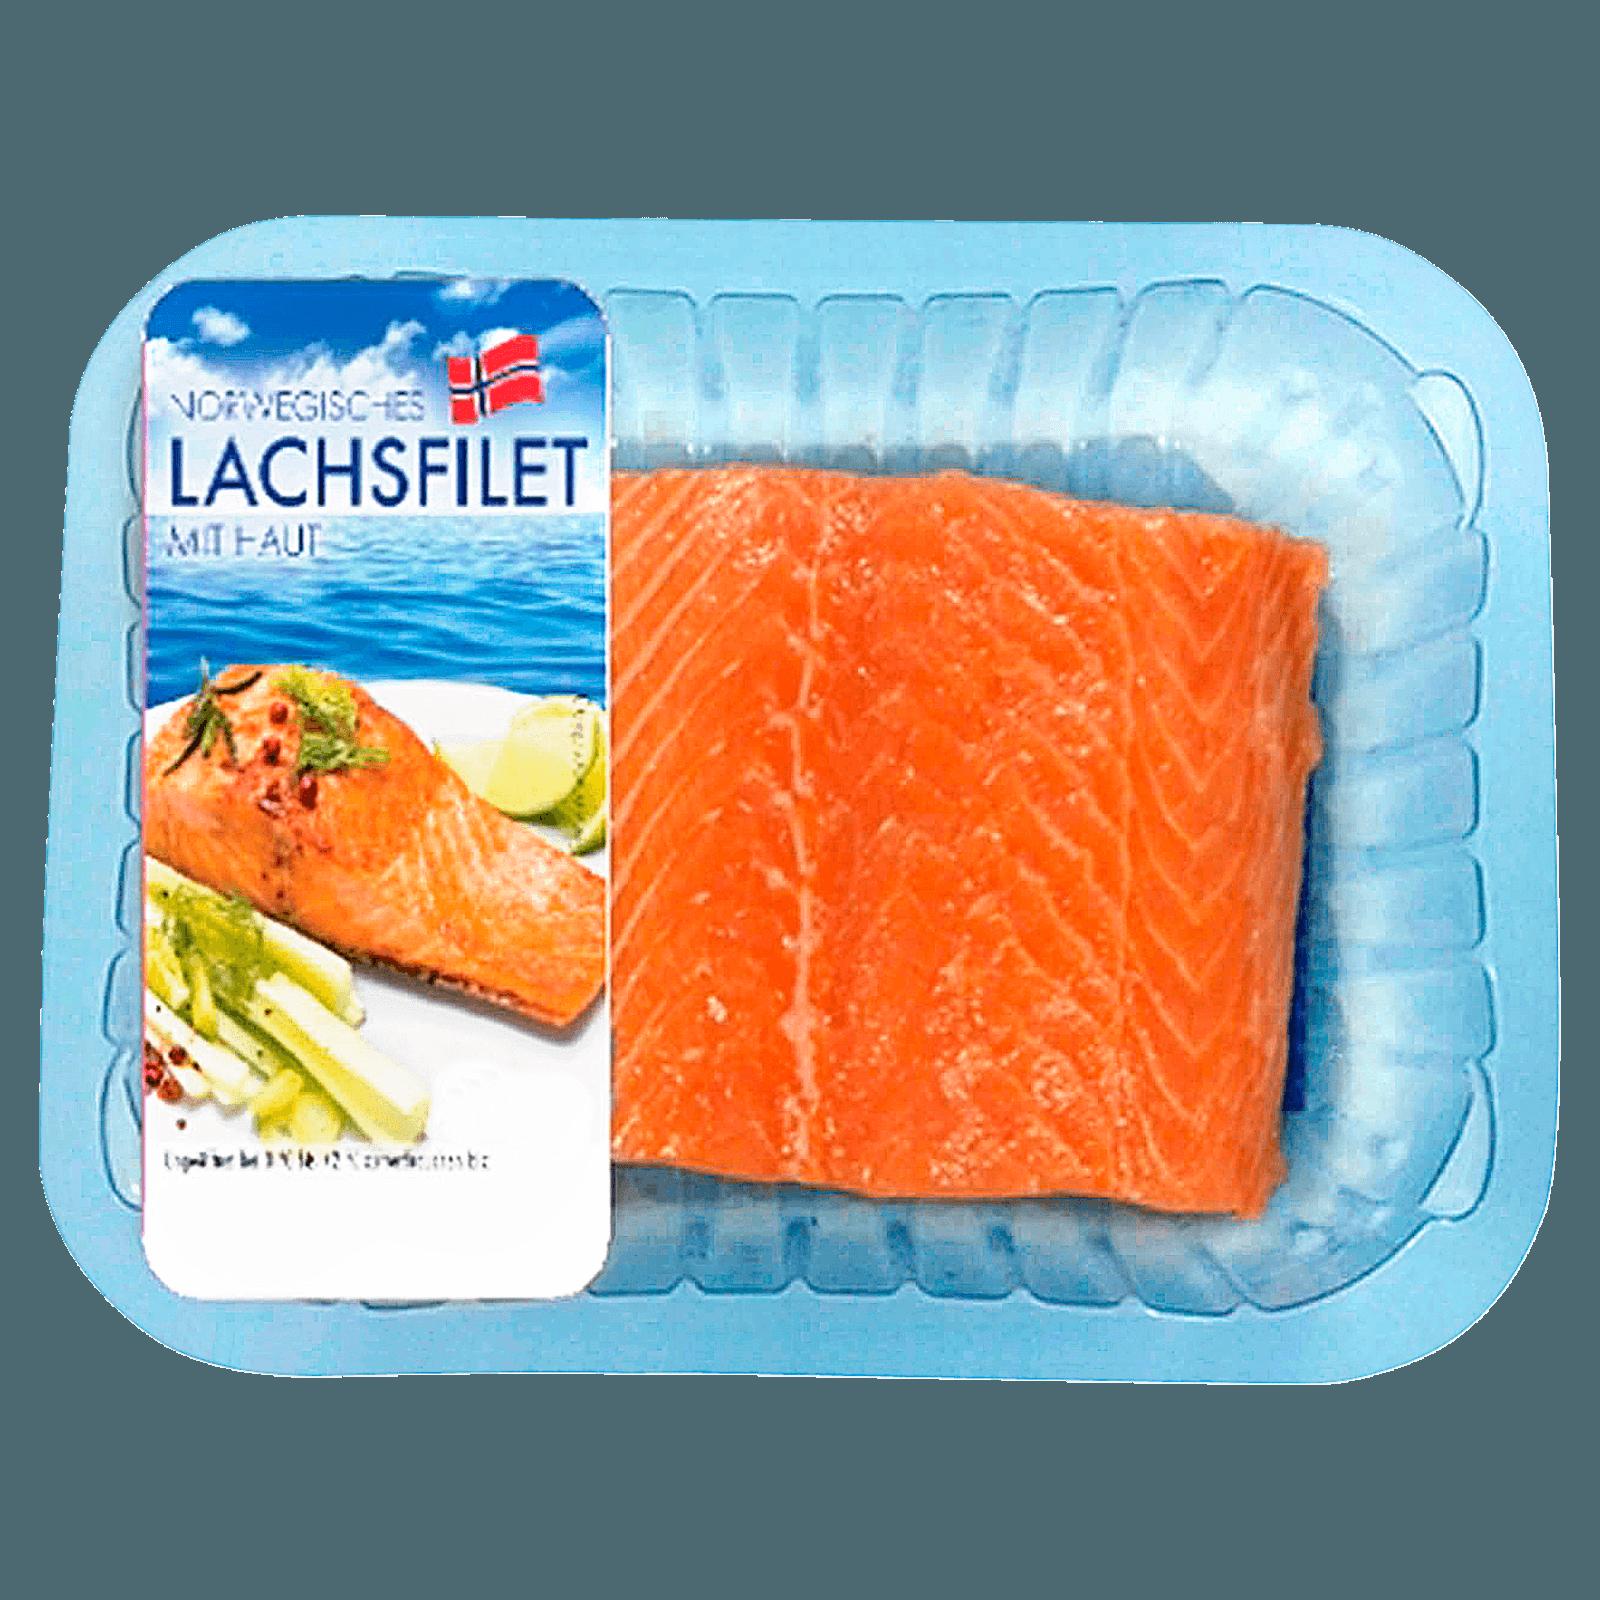 Profish Norwegisches Lachsfilet 250g